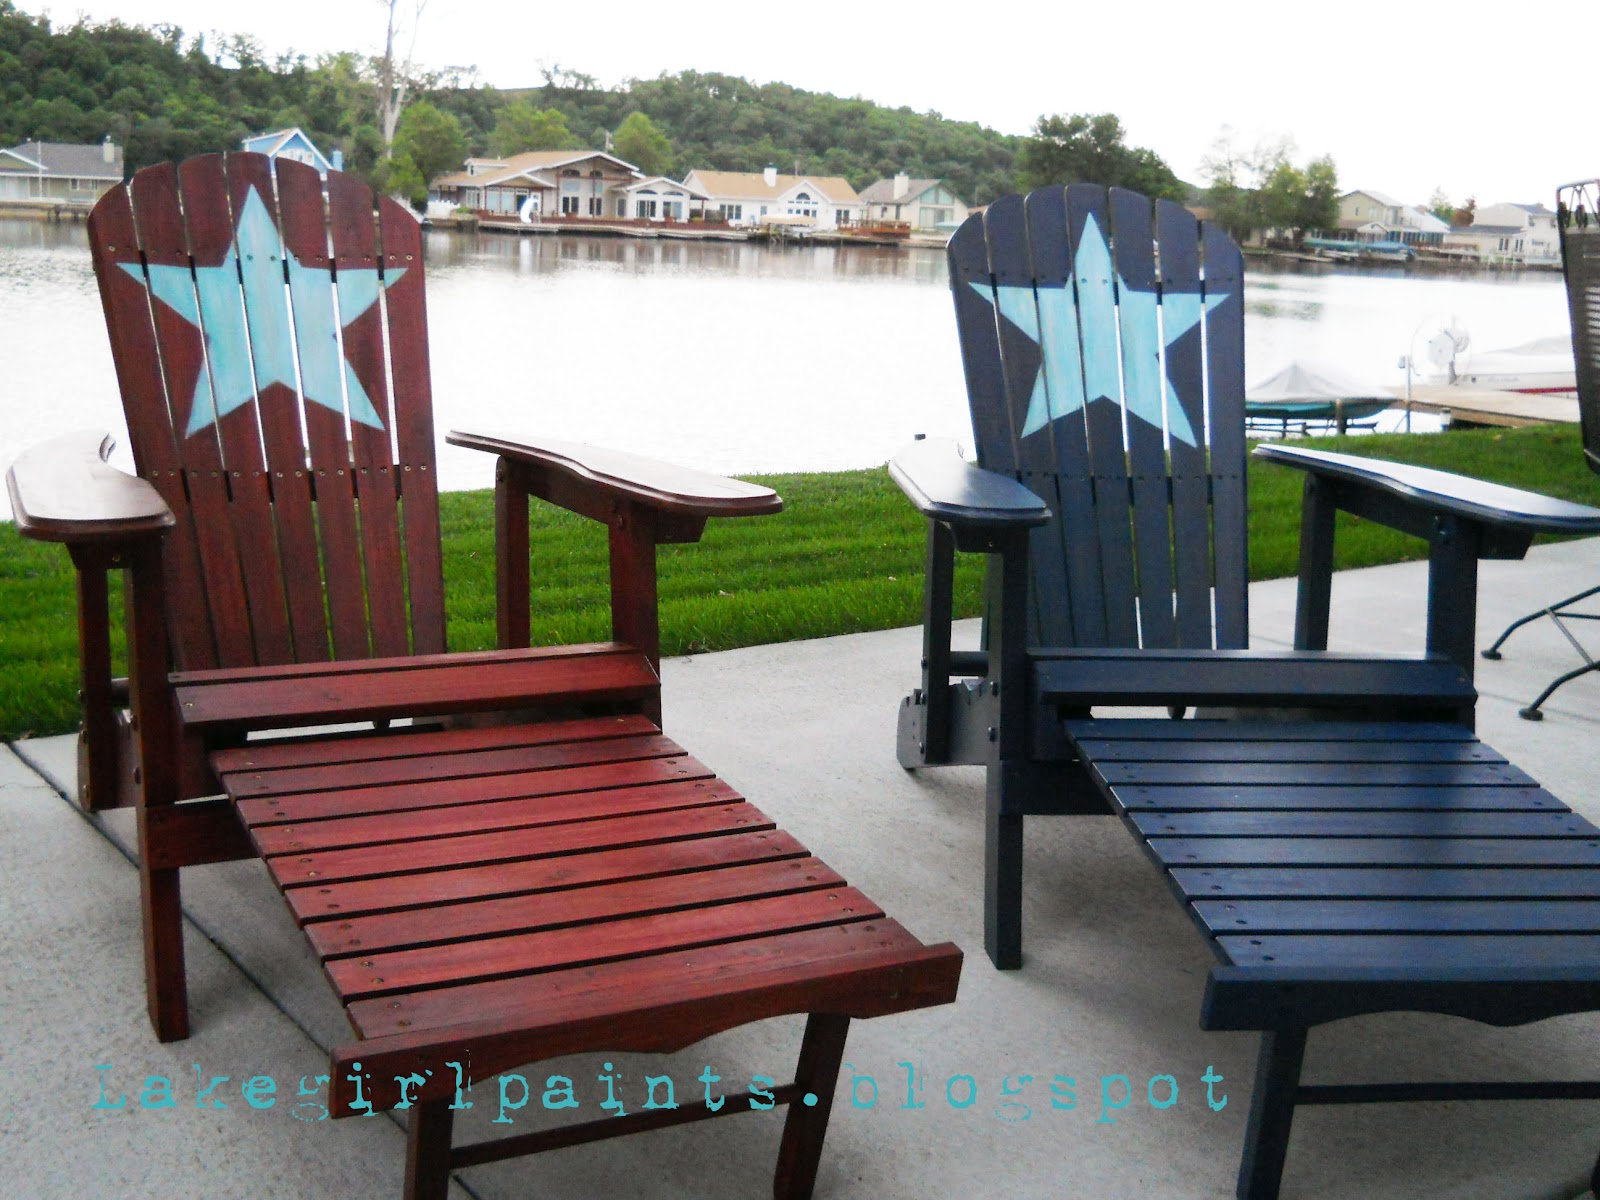 aqua adirondack chairs buy easy chair online lake girl paints: summer beach